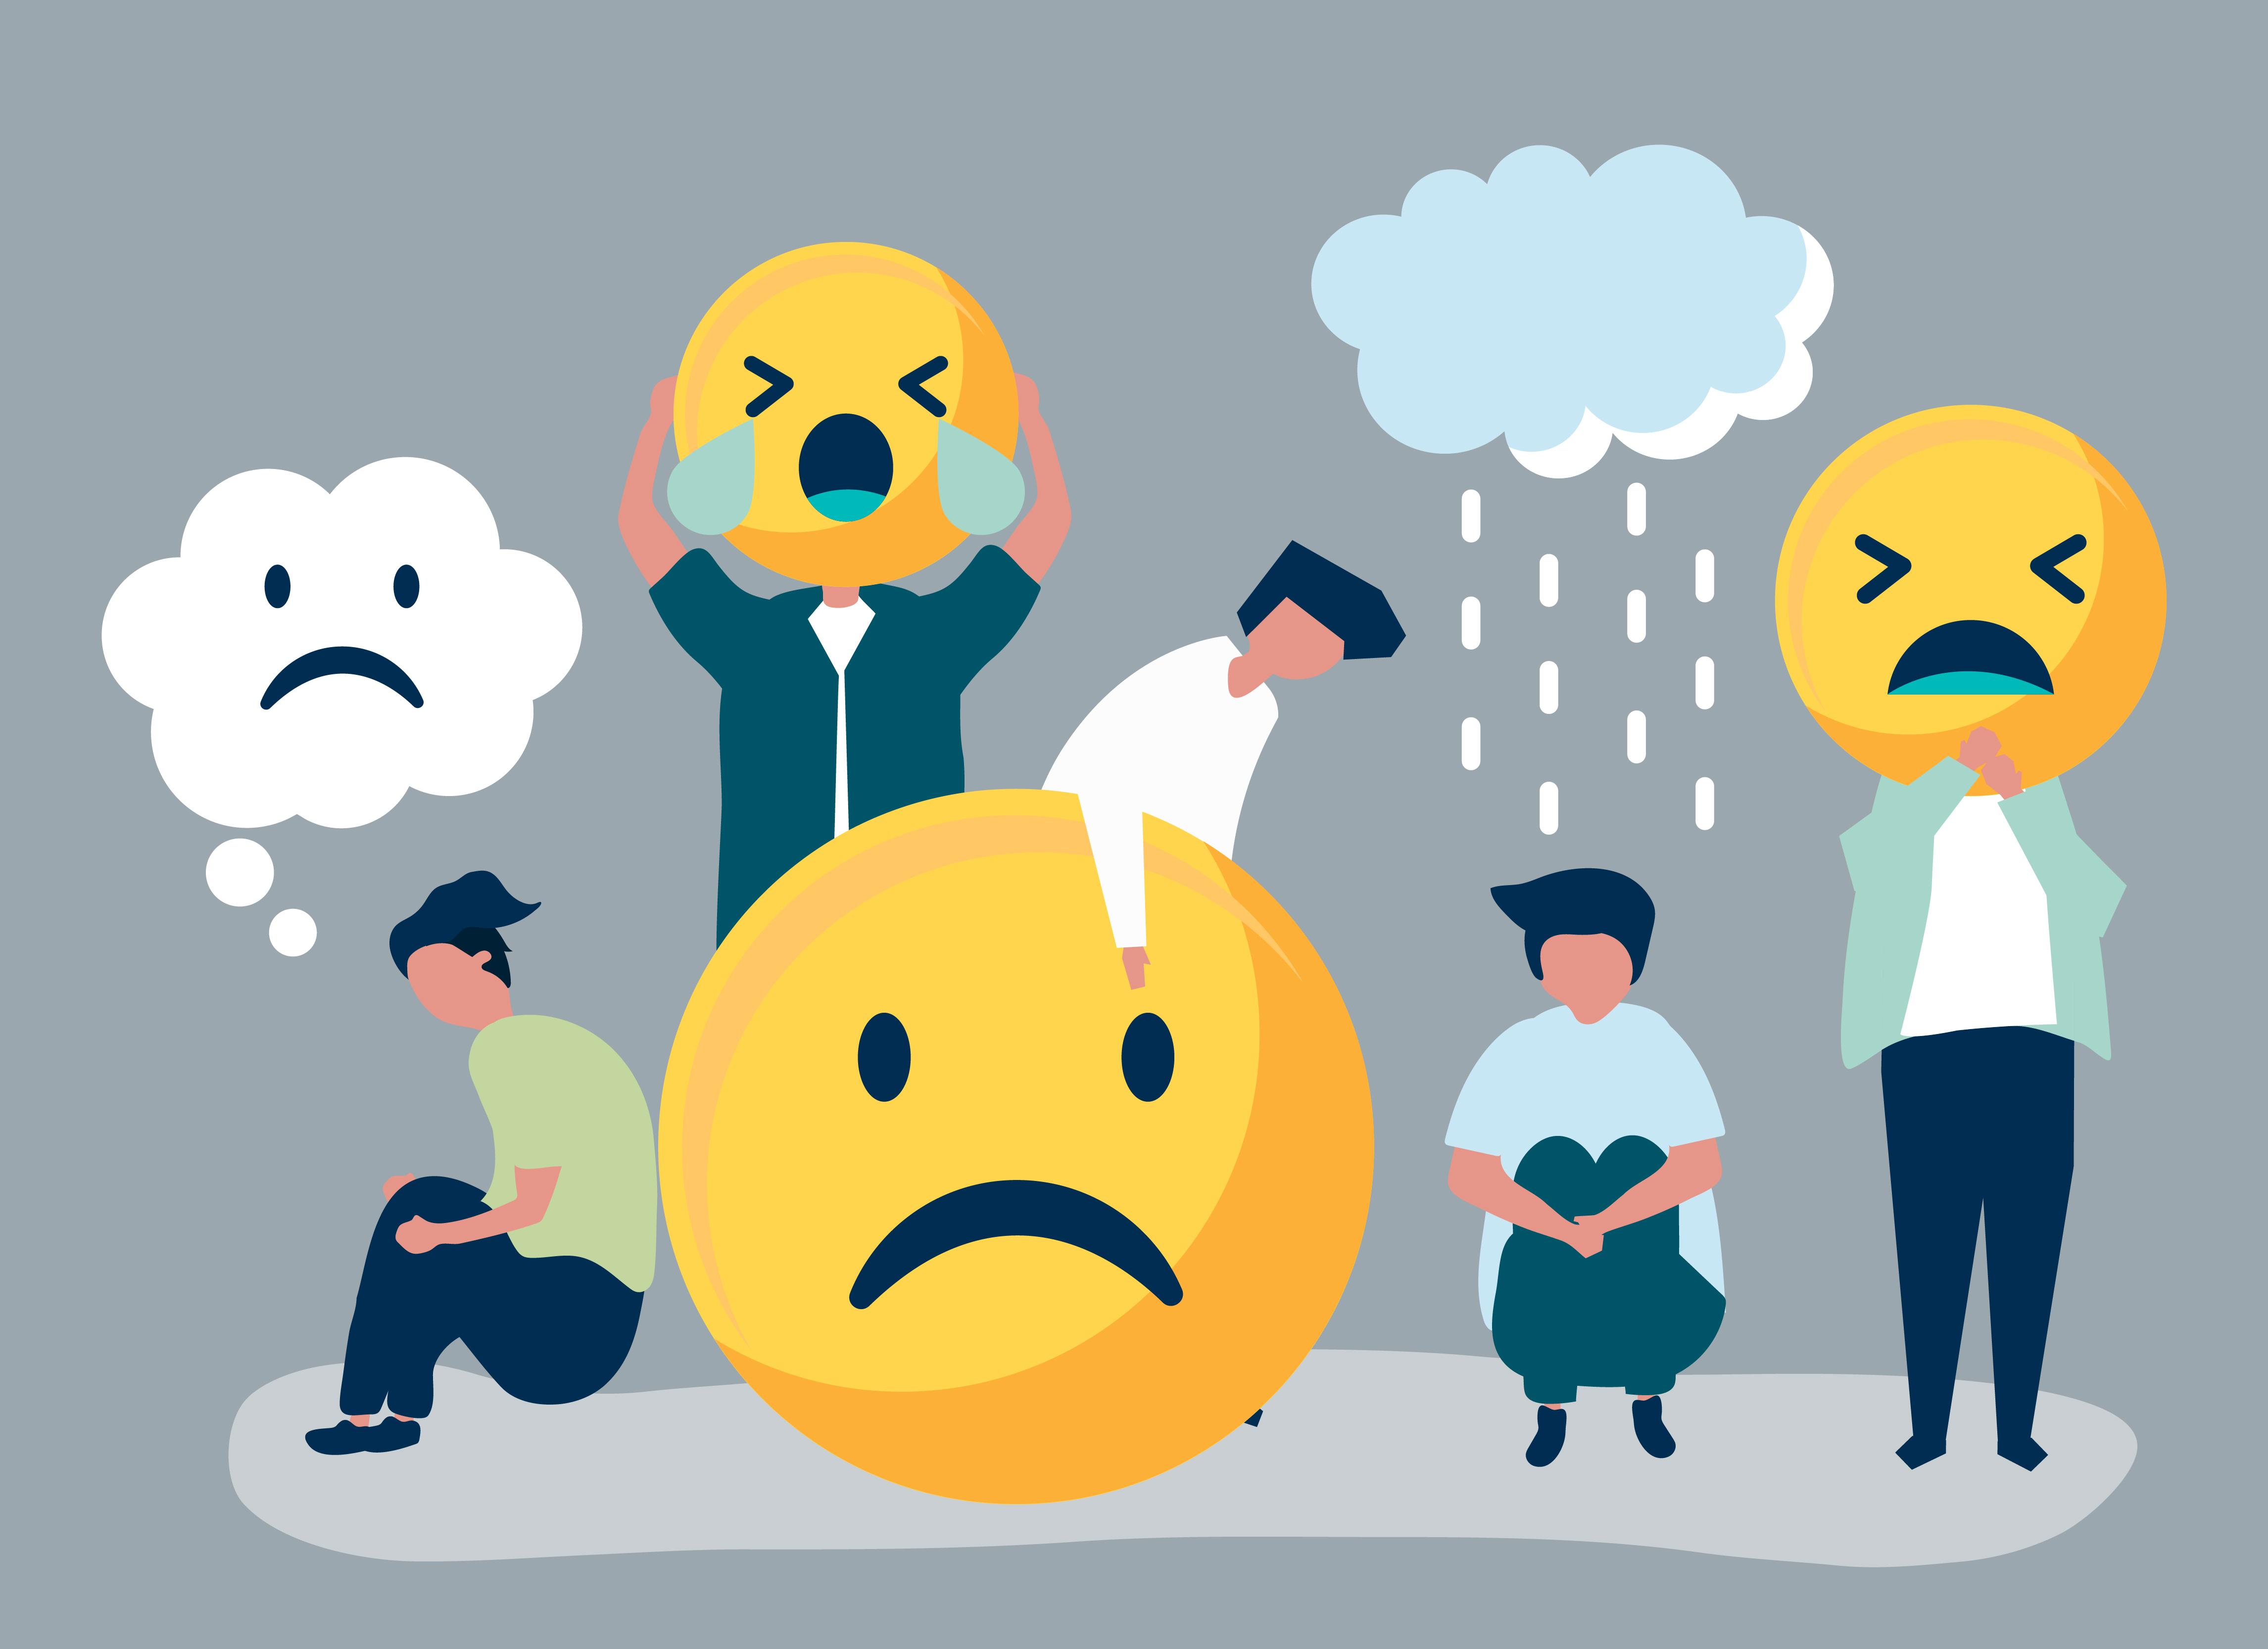 Cum invatam copilul sa-si gestioneze emotiile negative?   Jucarii vorbarete